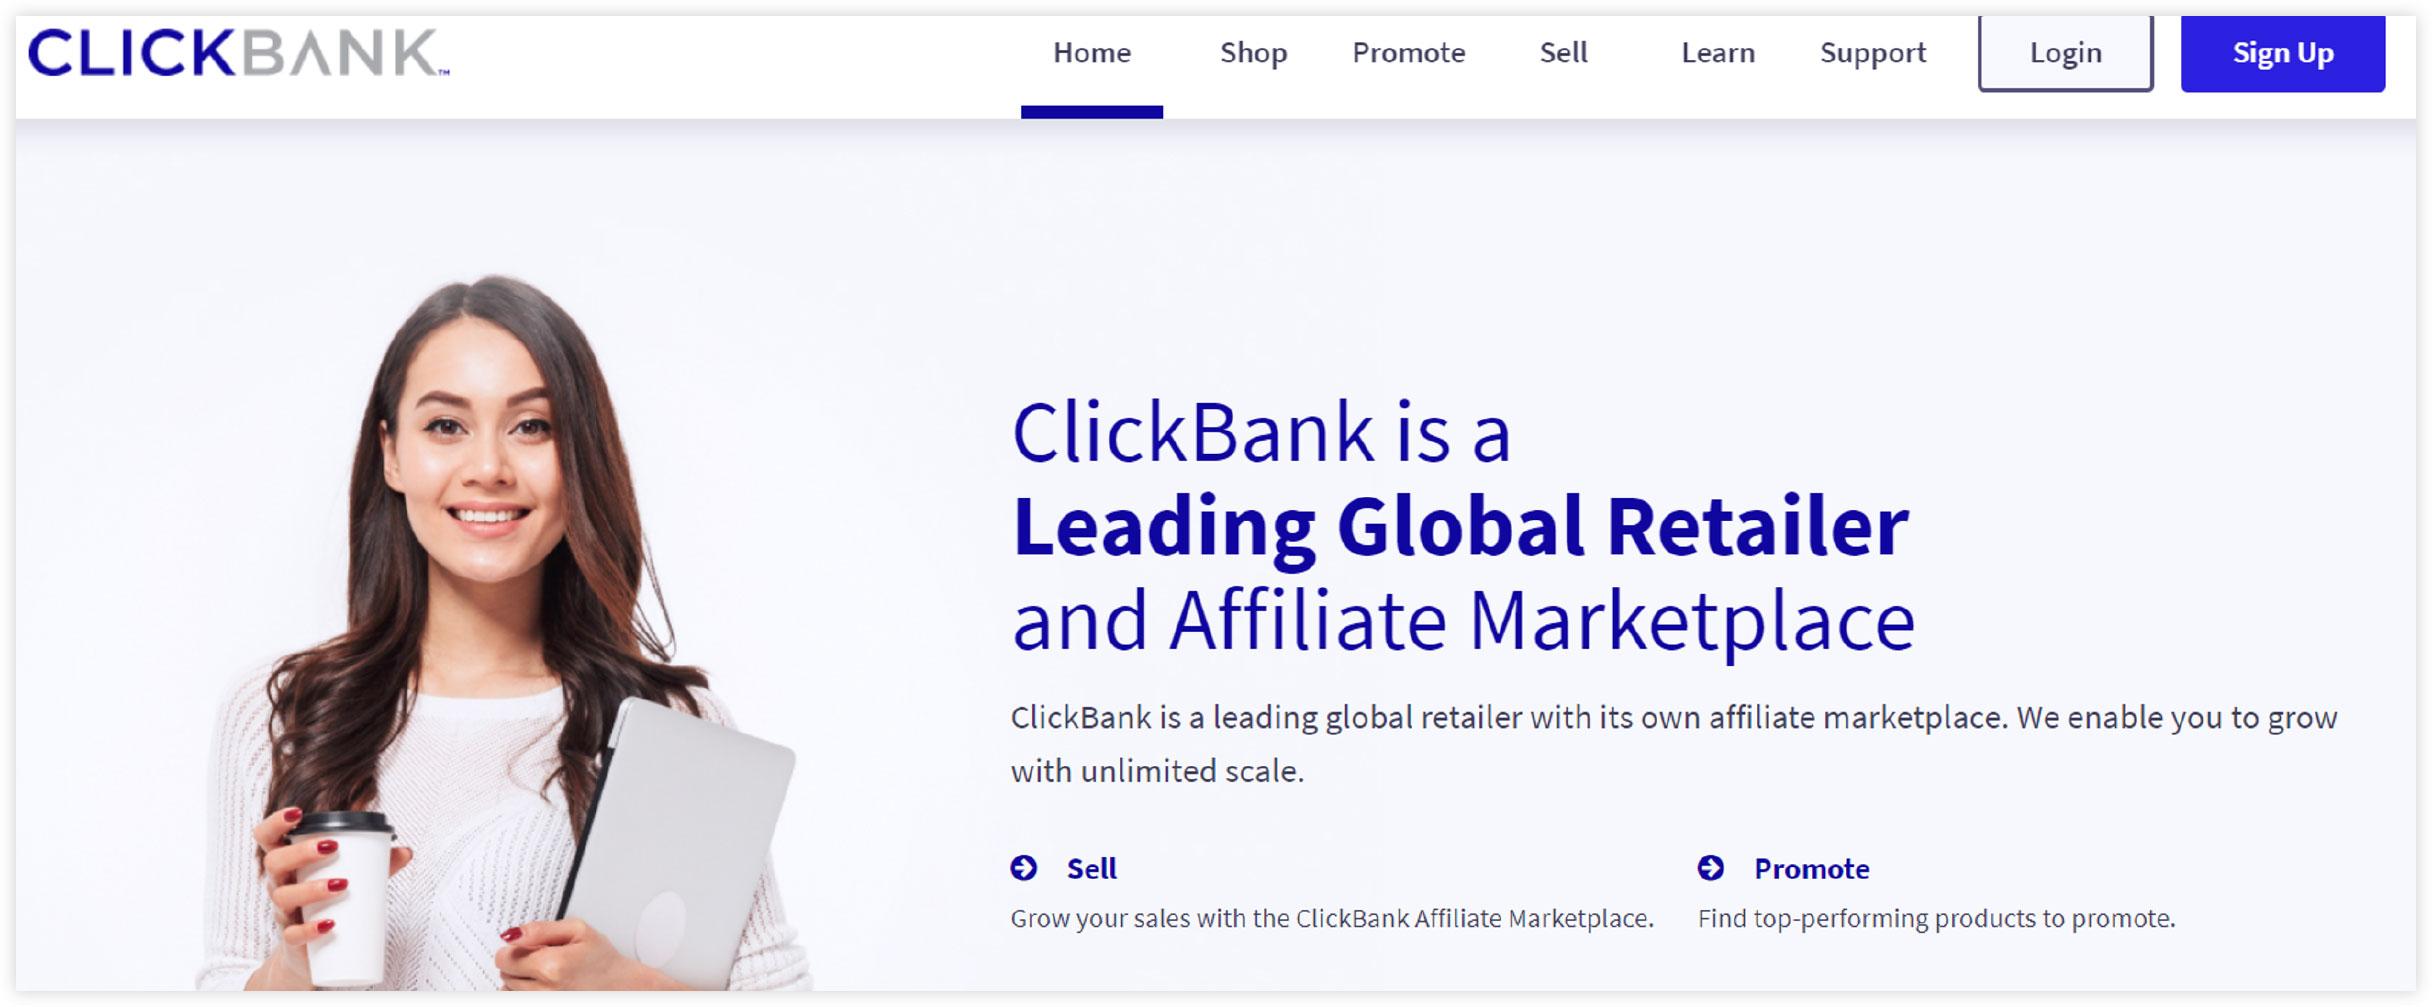 Affiliate Marketplace - ClickBank